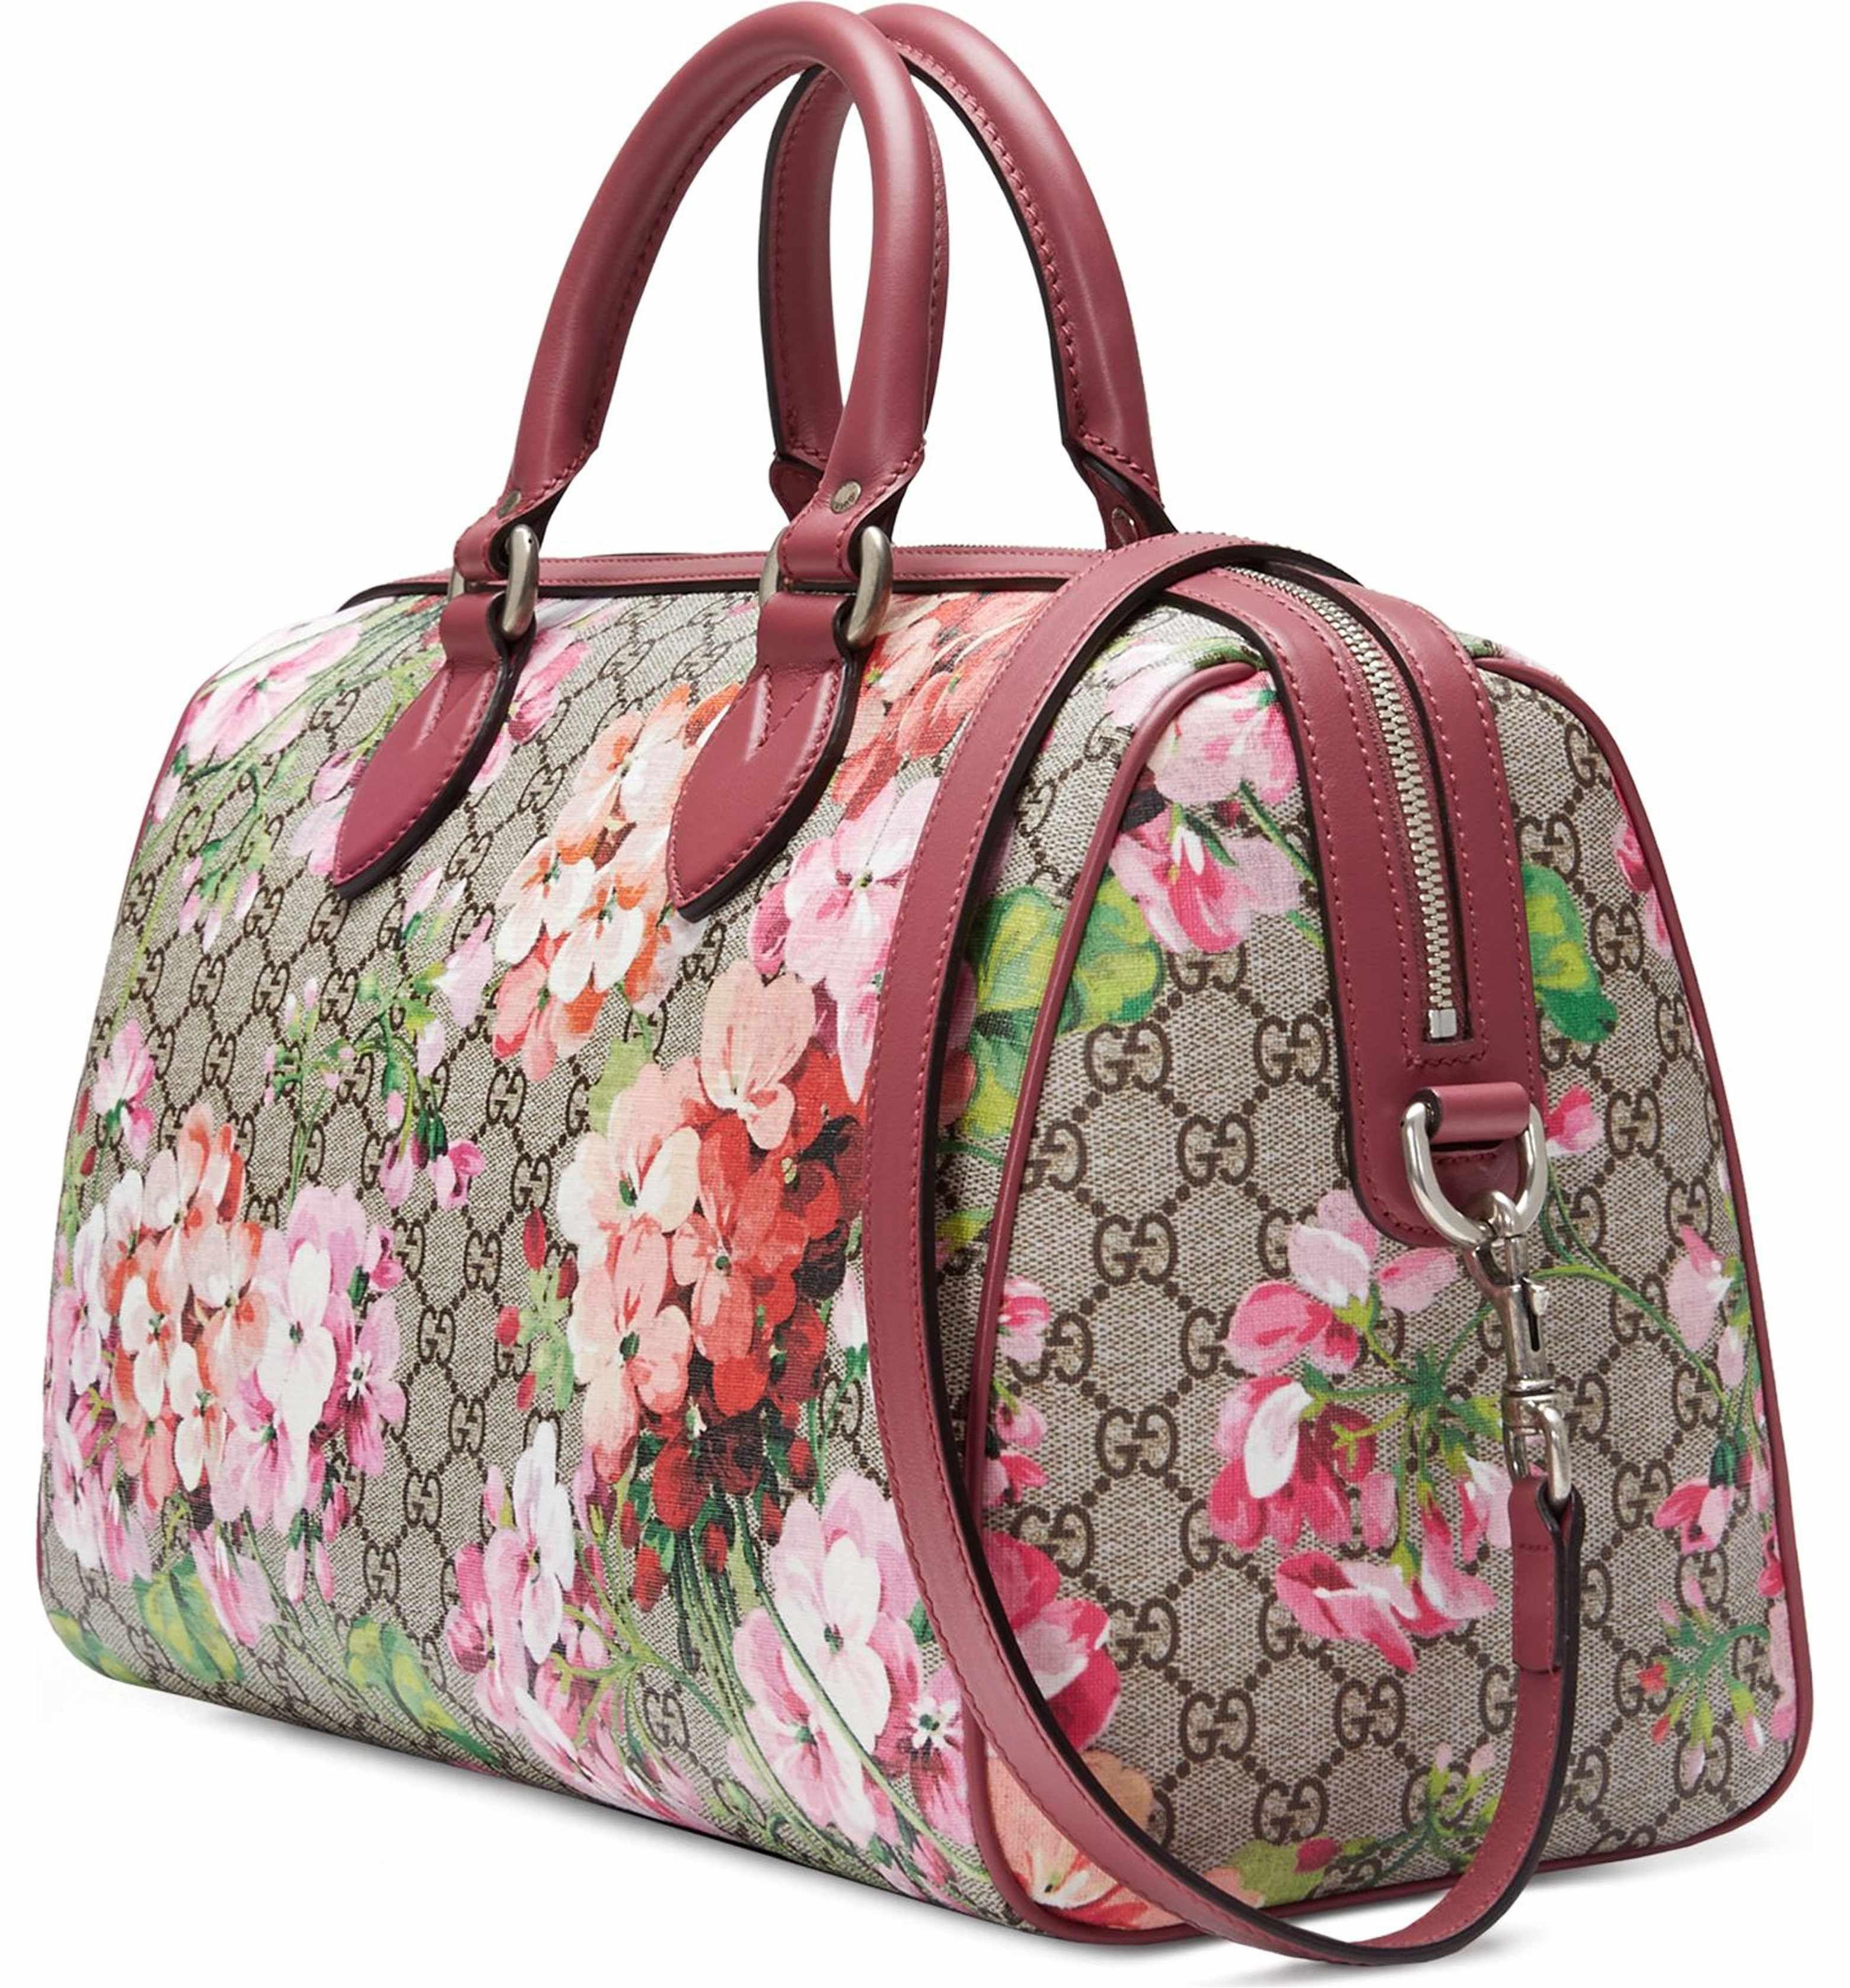 Main Image - Gucci Medium Blooms GG Supreme Top Handle Canvas Bag Top  Handle Bags, 0807ac554f